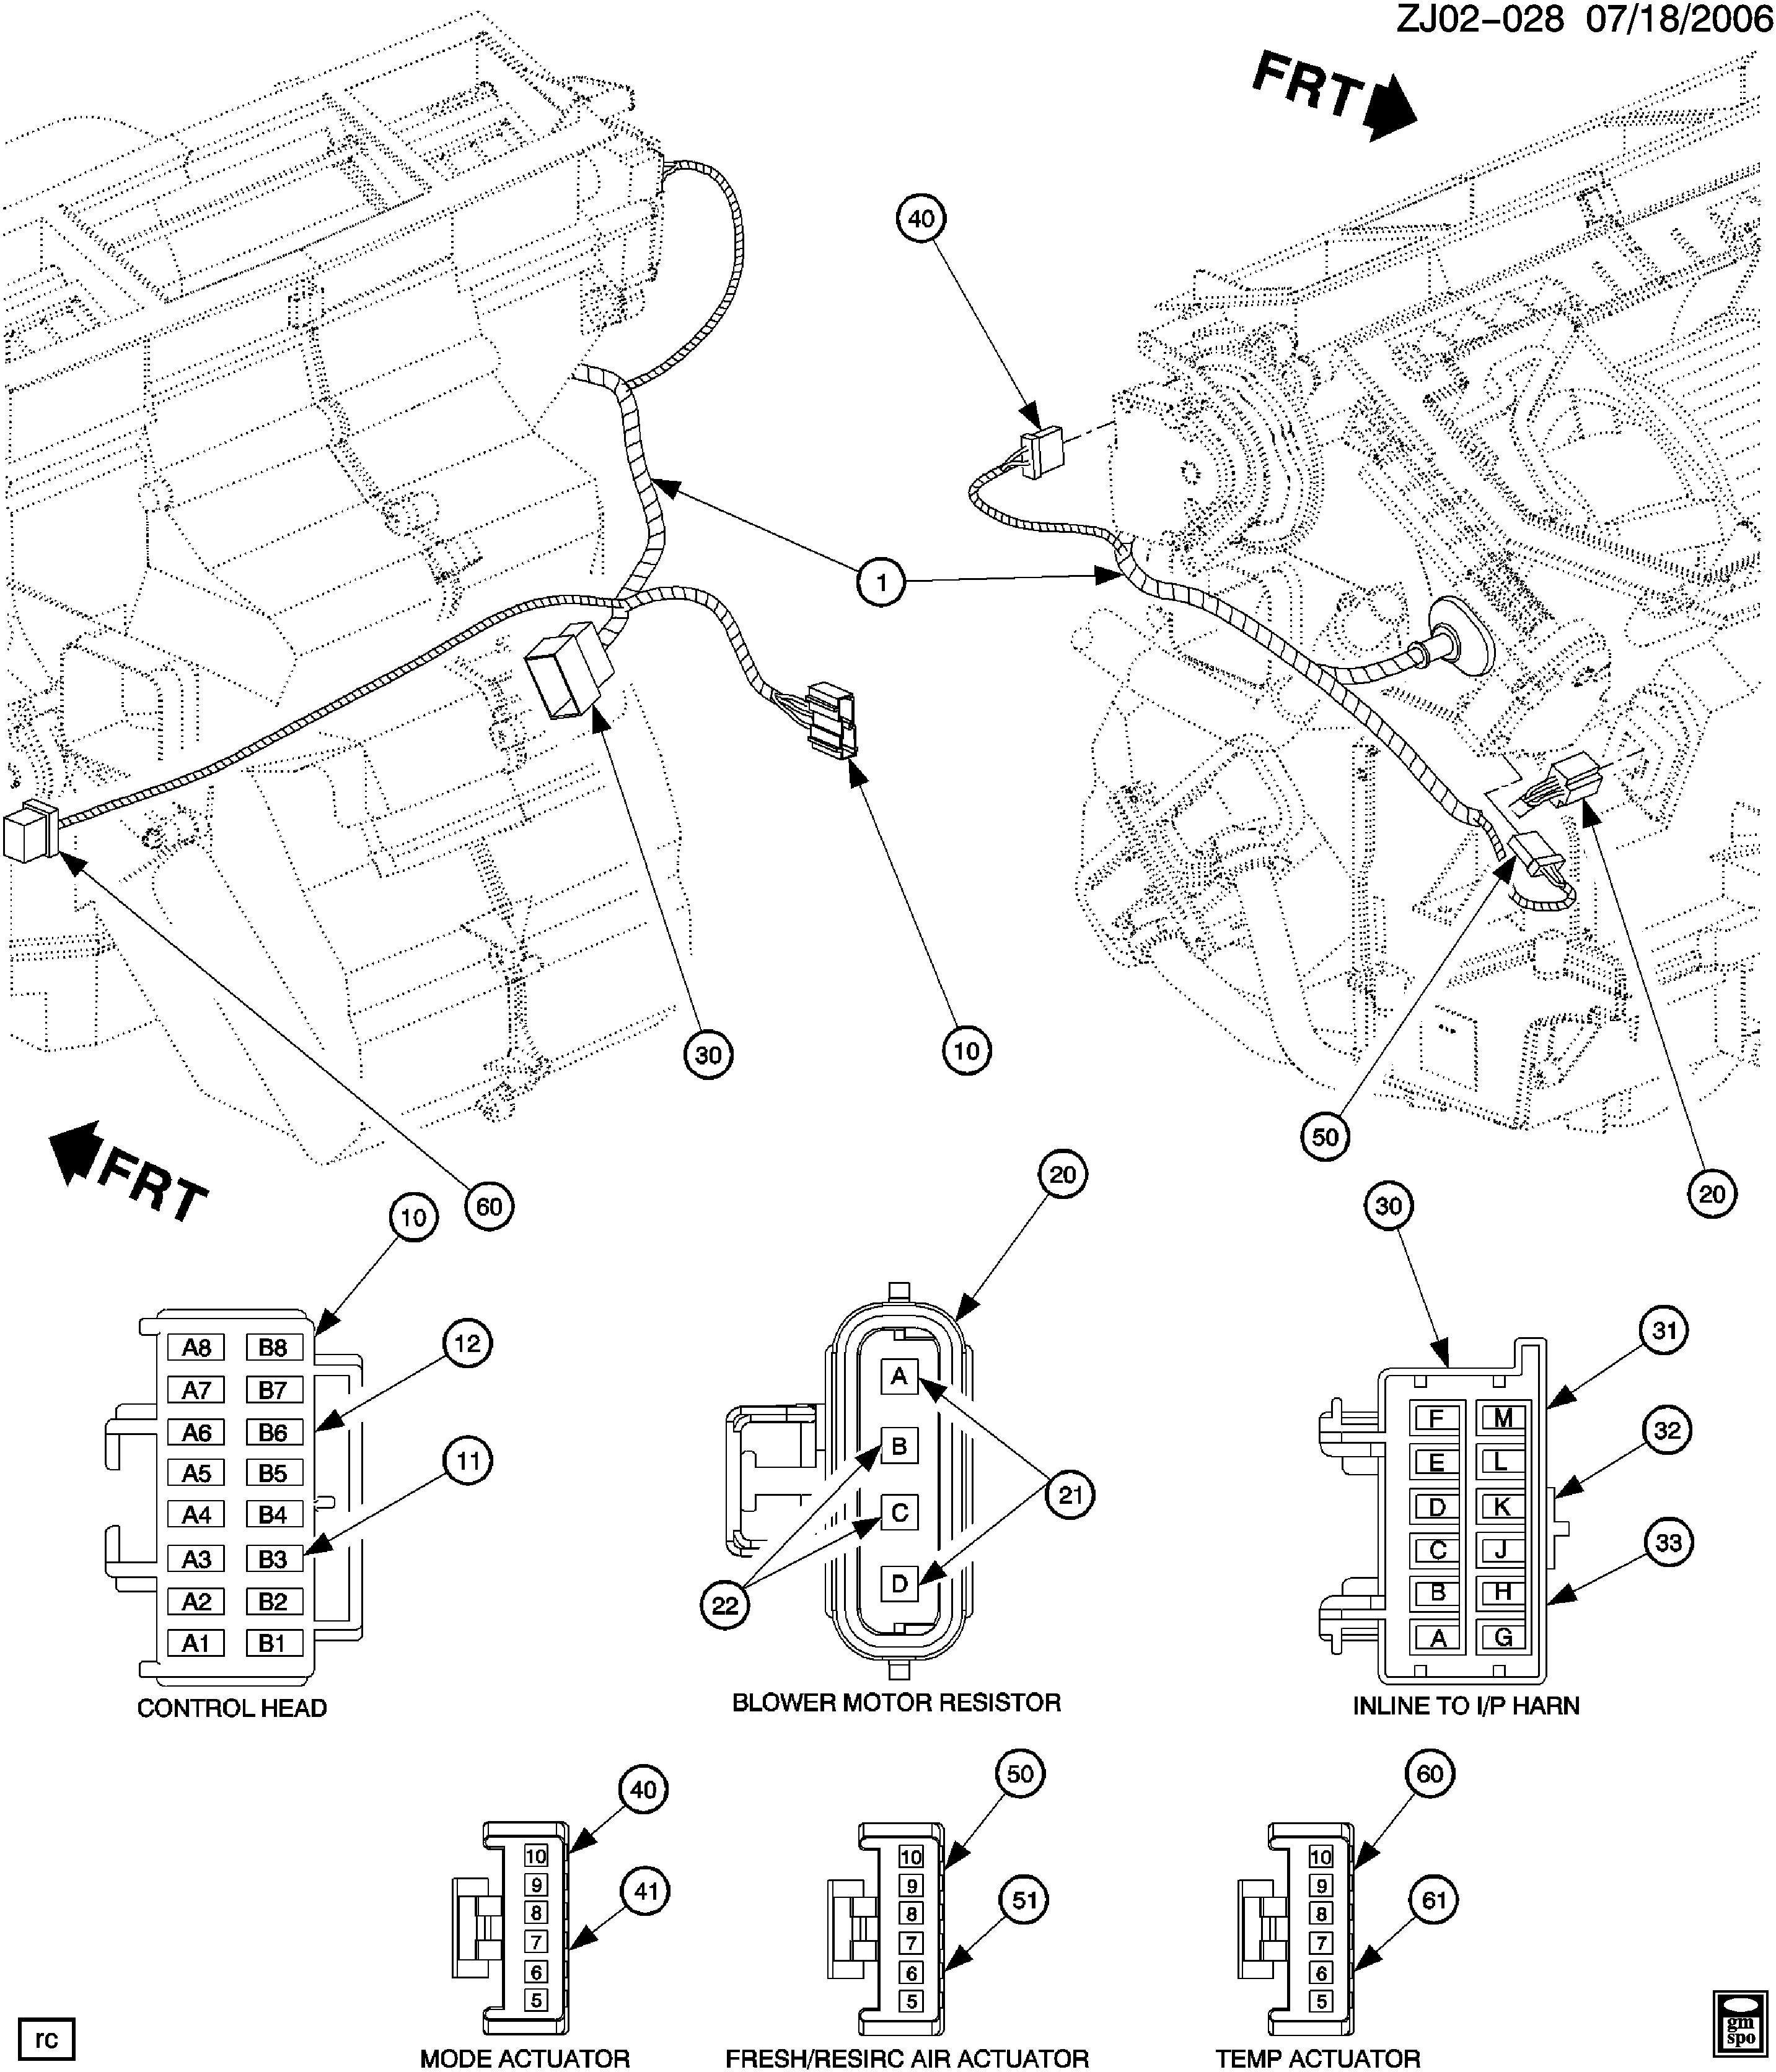 Saturn L Series J Wiring Harness Hvac Connector Views Epc Spare Parts Catalog